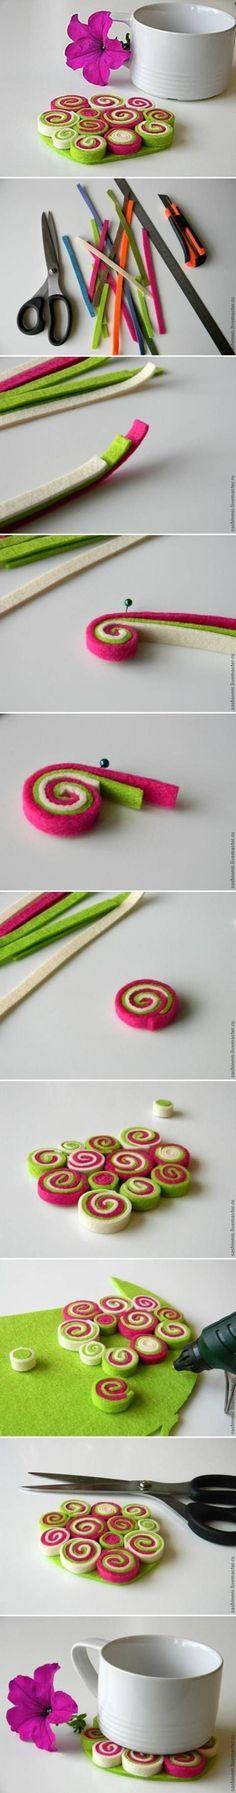 DIY 毛...来自liaoyaji的图片分享-堆糖